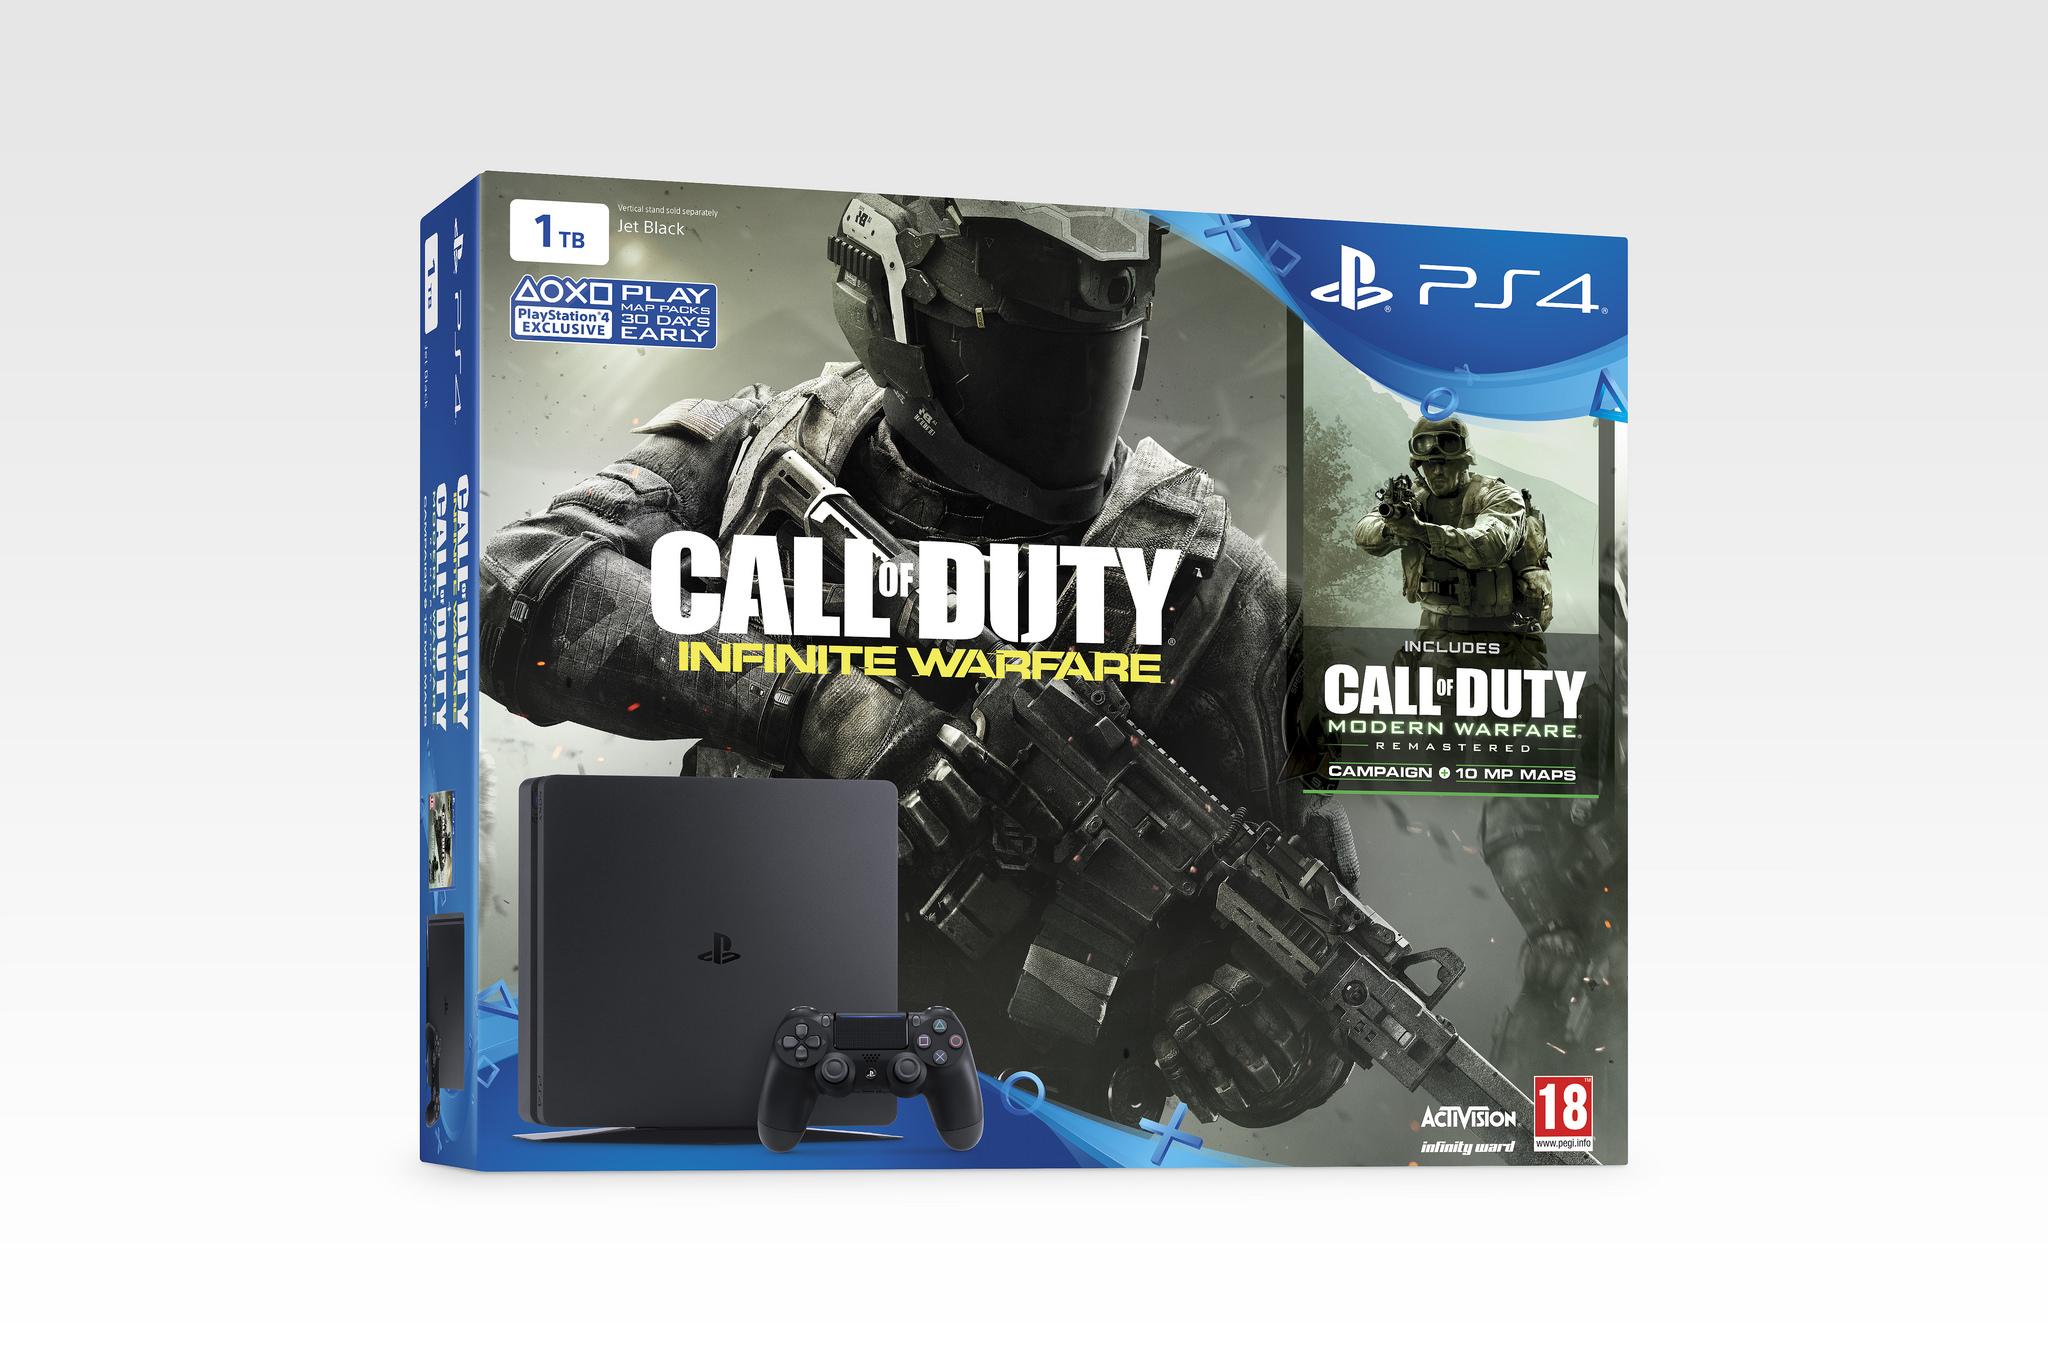 Pack PS4 Slim4